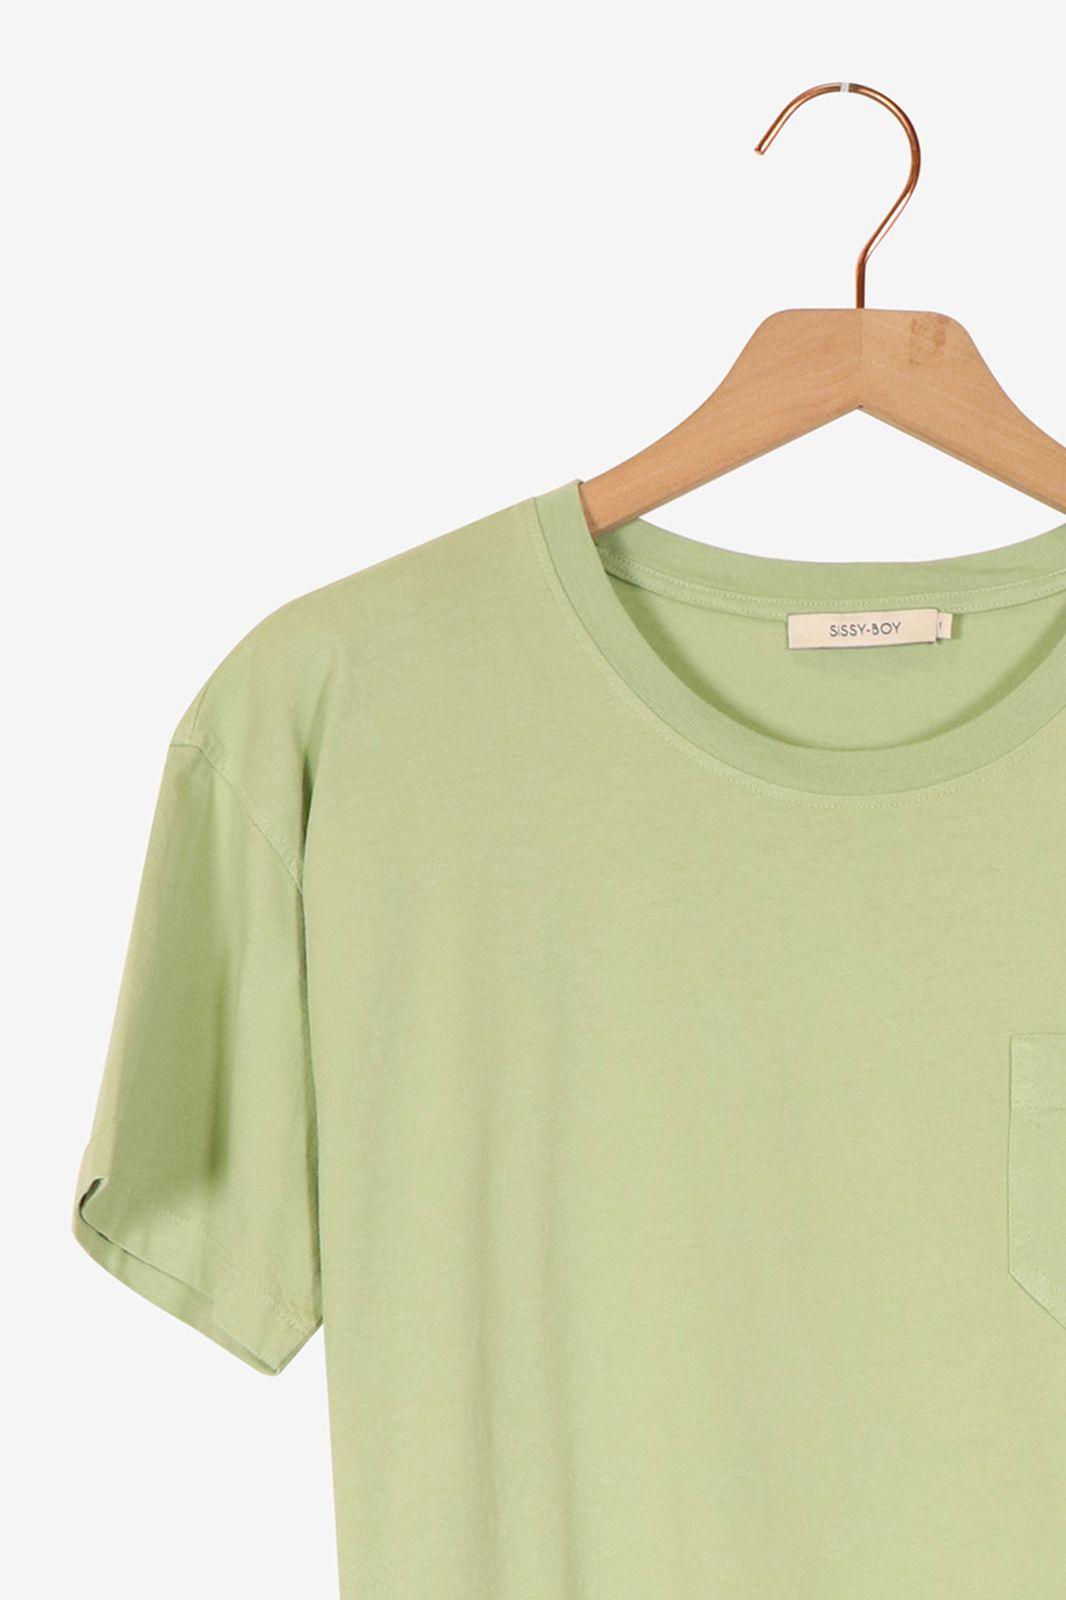 Groen T-shirt korte mouwen